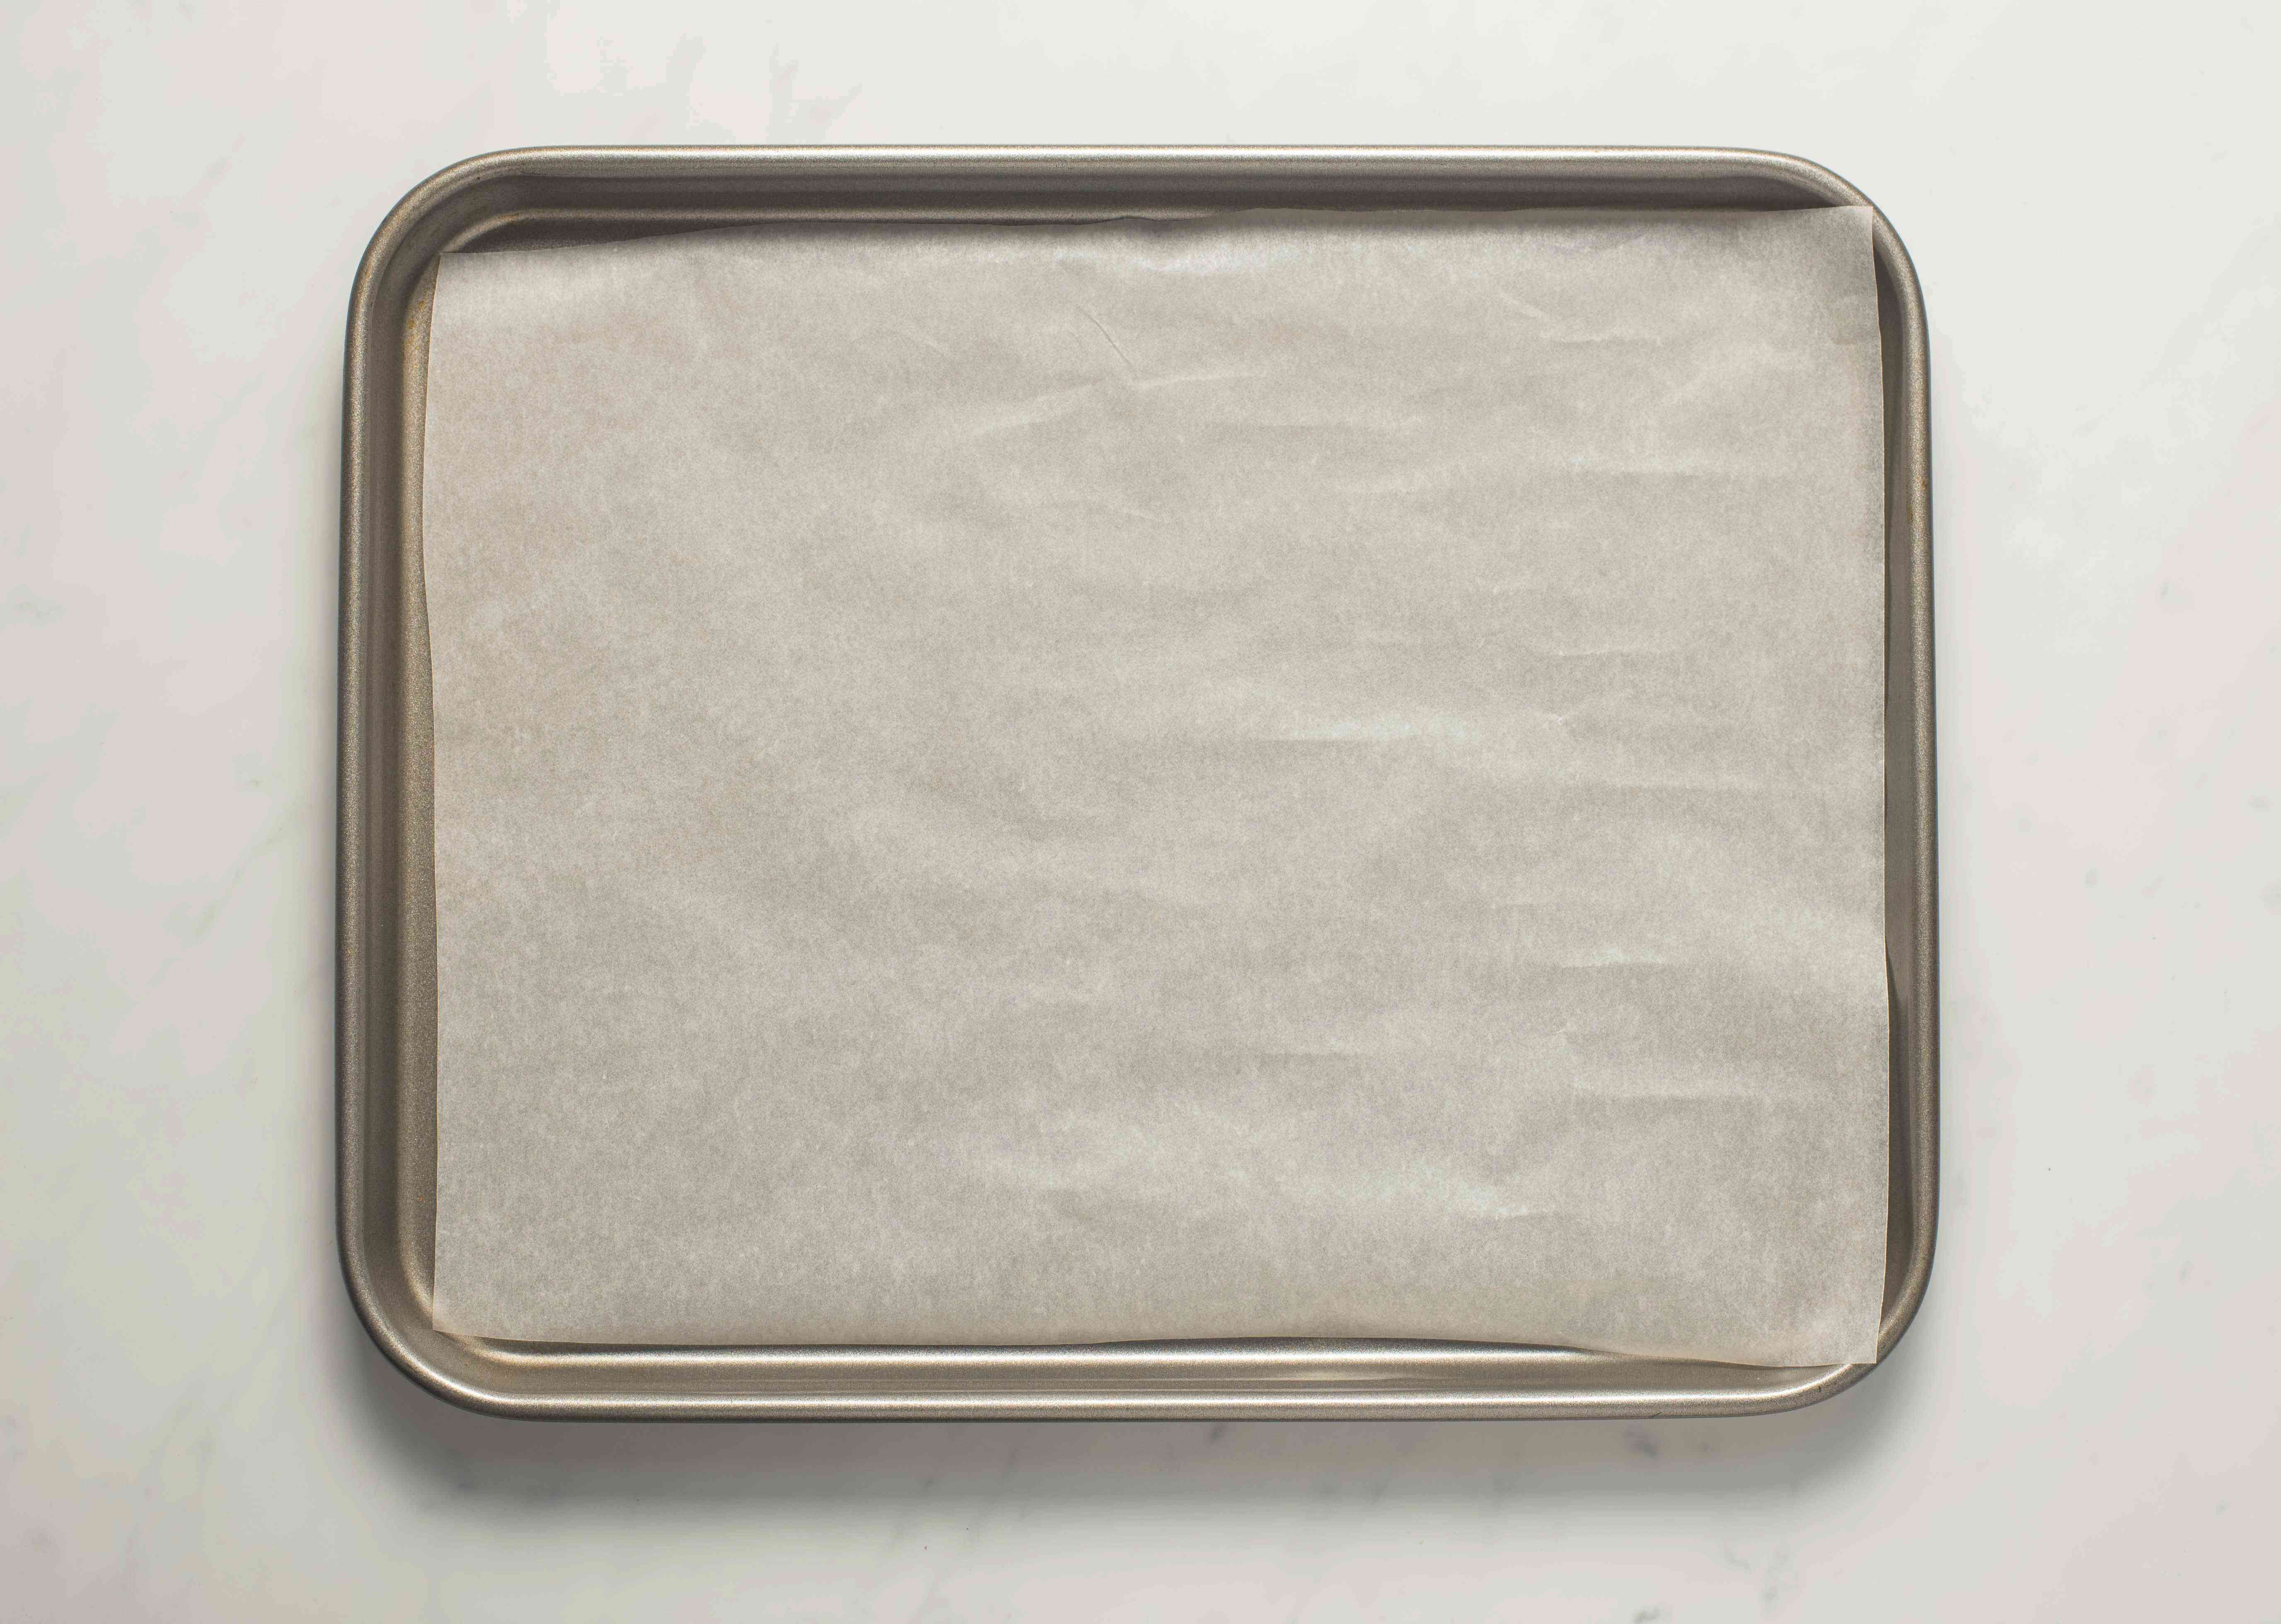 Line a cookie sheet